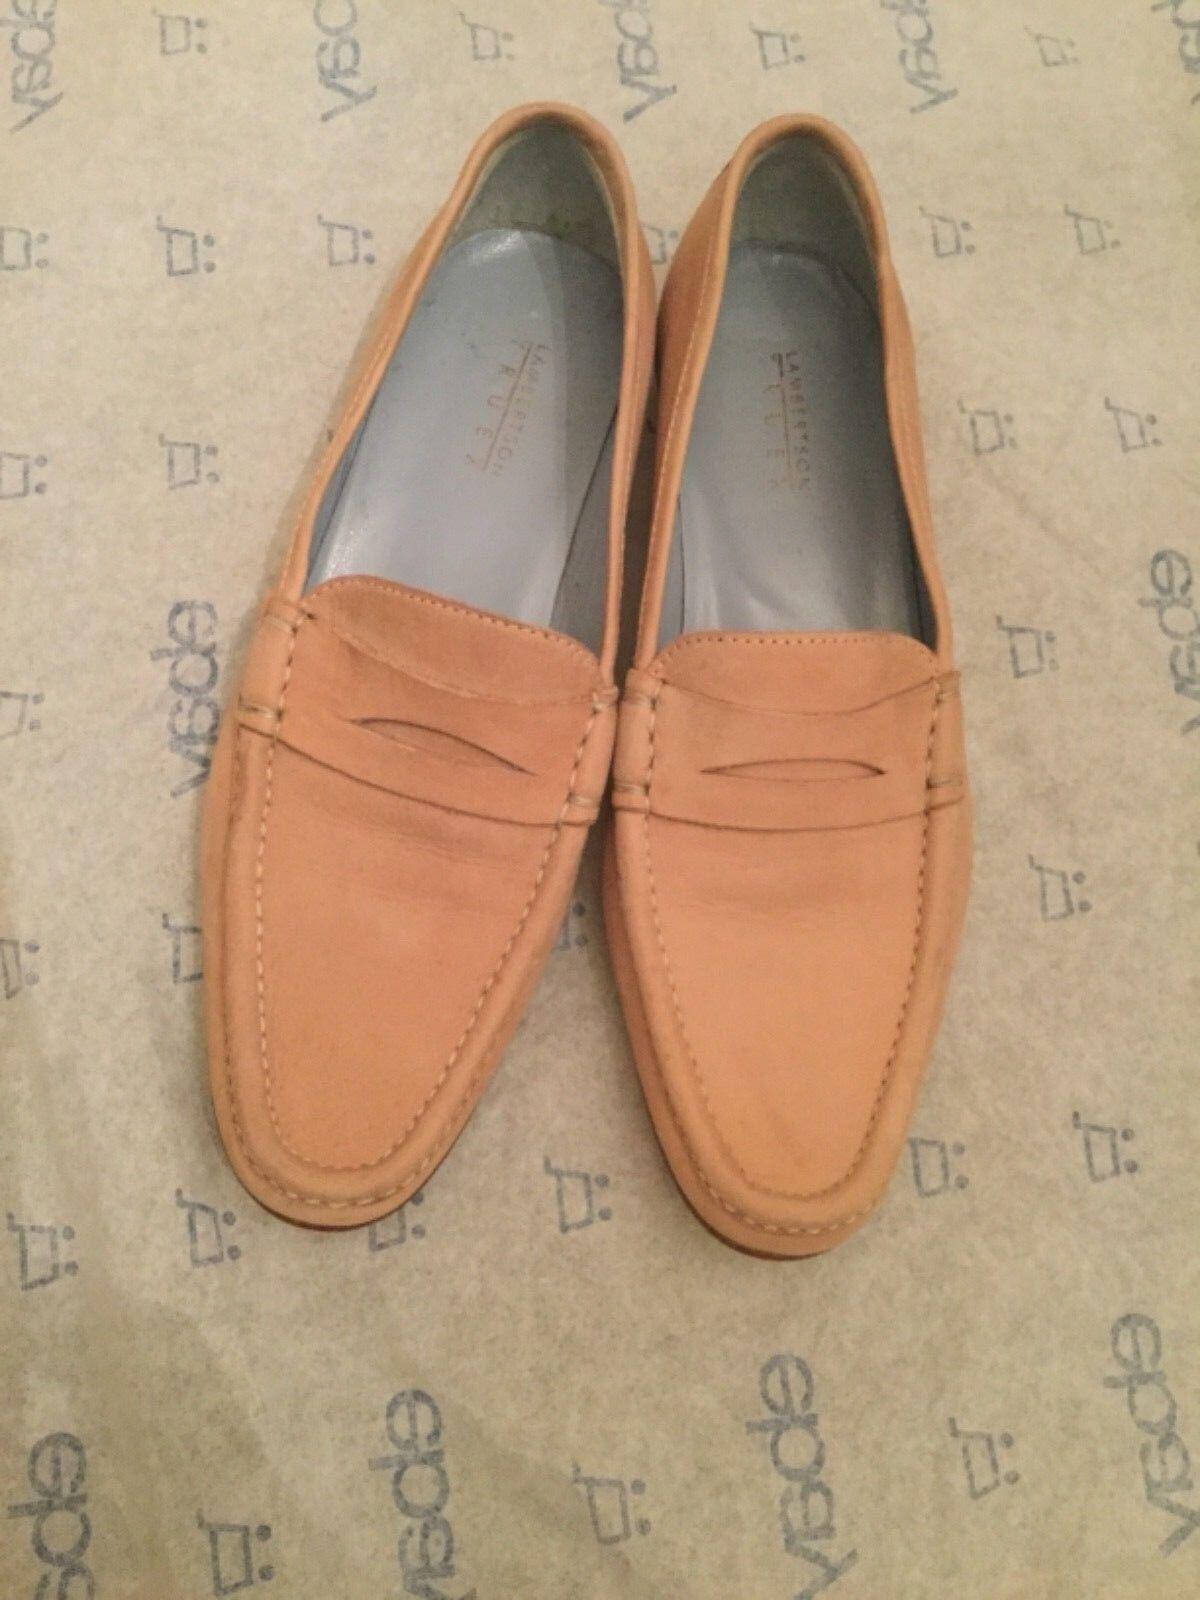 acquista online EXCELLENT CONDITION Lambertson Truex donna's Slip-on Slip-on Slip-on Suede Loafers - 7  alto sconto